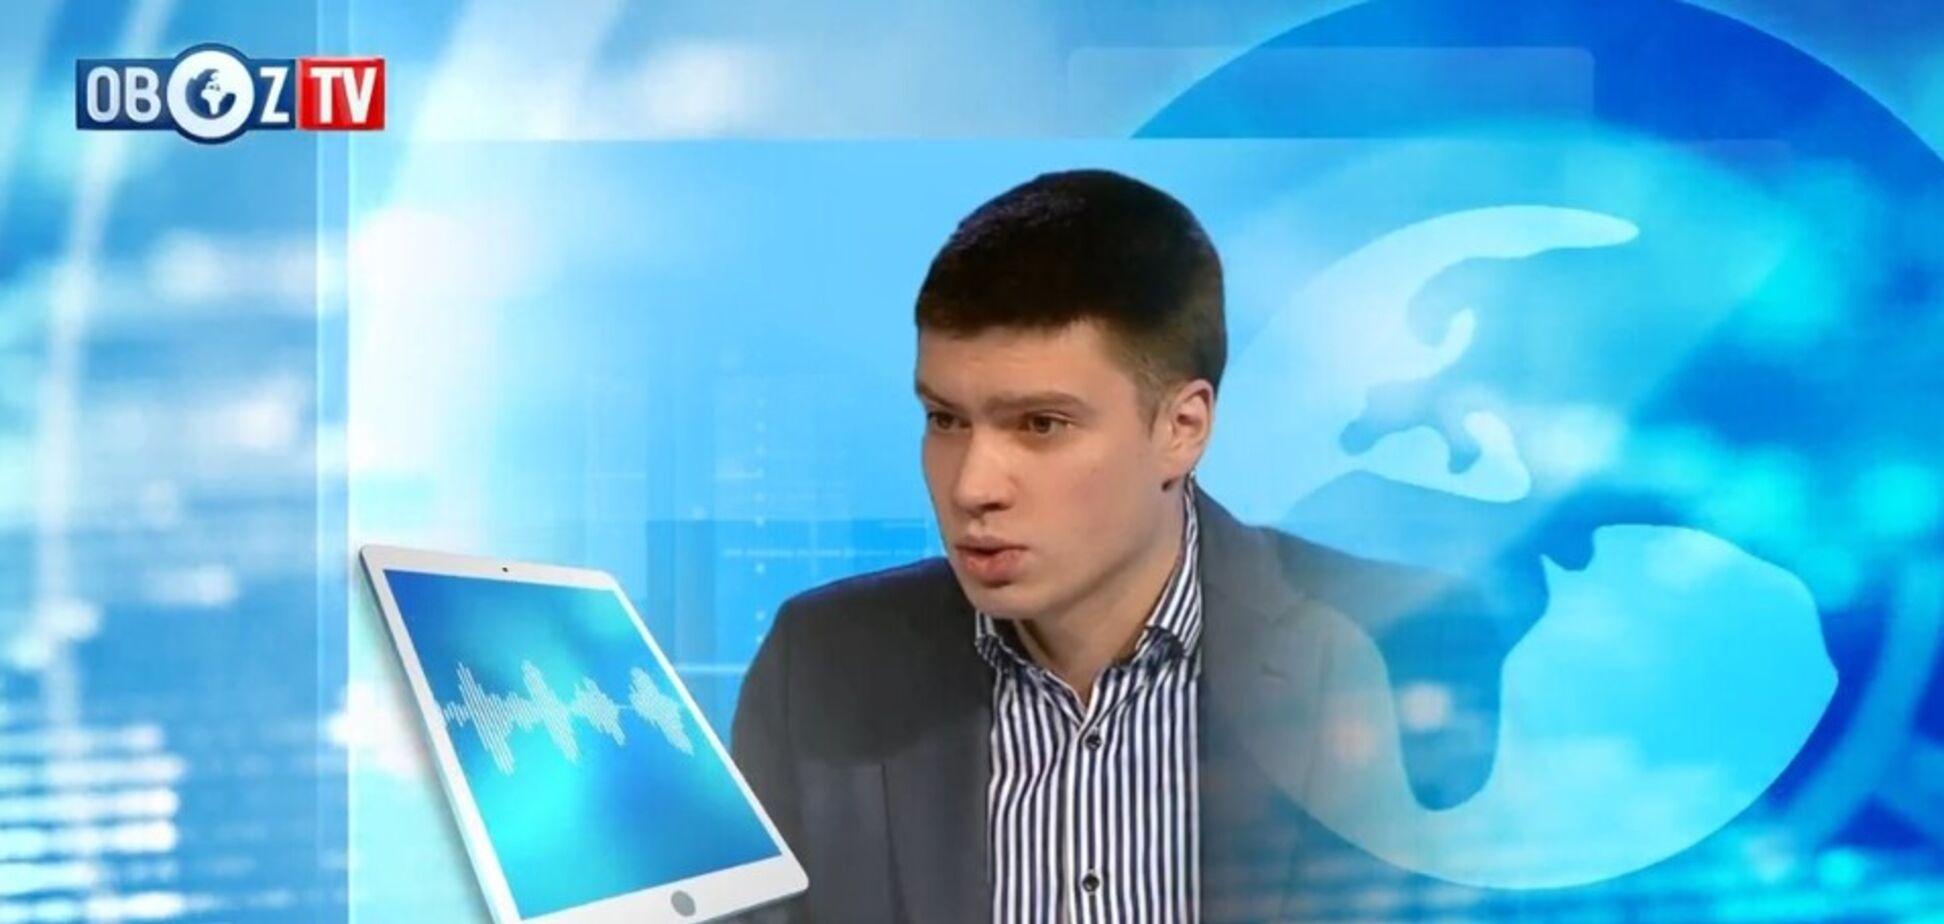 Фанат Путина в комитете по национальной безопасности: комментарии юриста